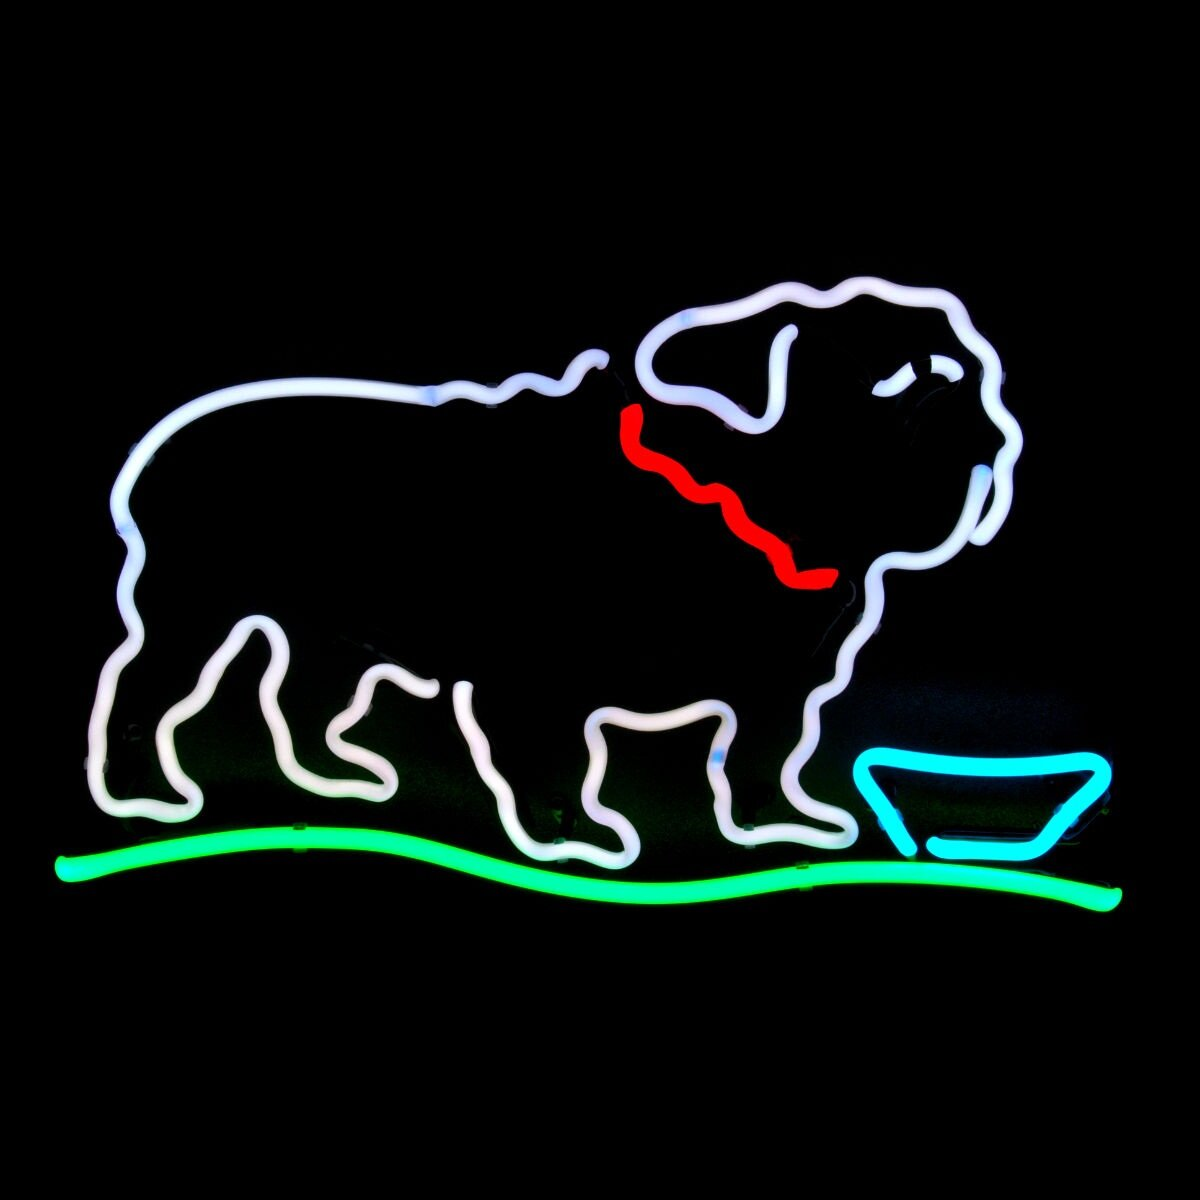 GREAT GIFTS FOR DOG LOVERS! - DOG NEON LIGHT ARTWORK by John Barton - BartonNeonMagic.com